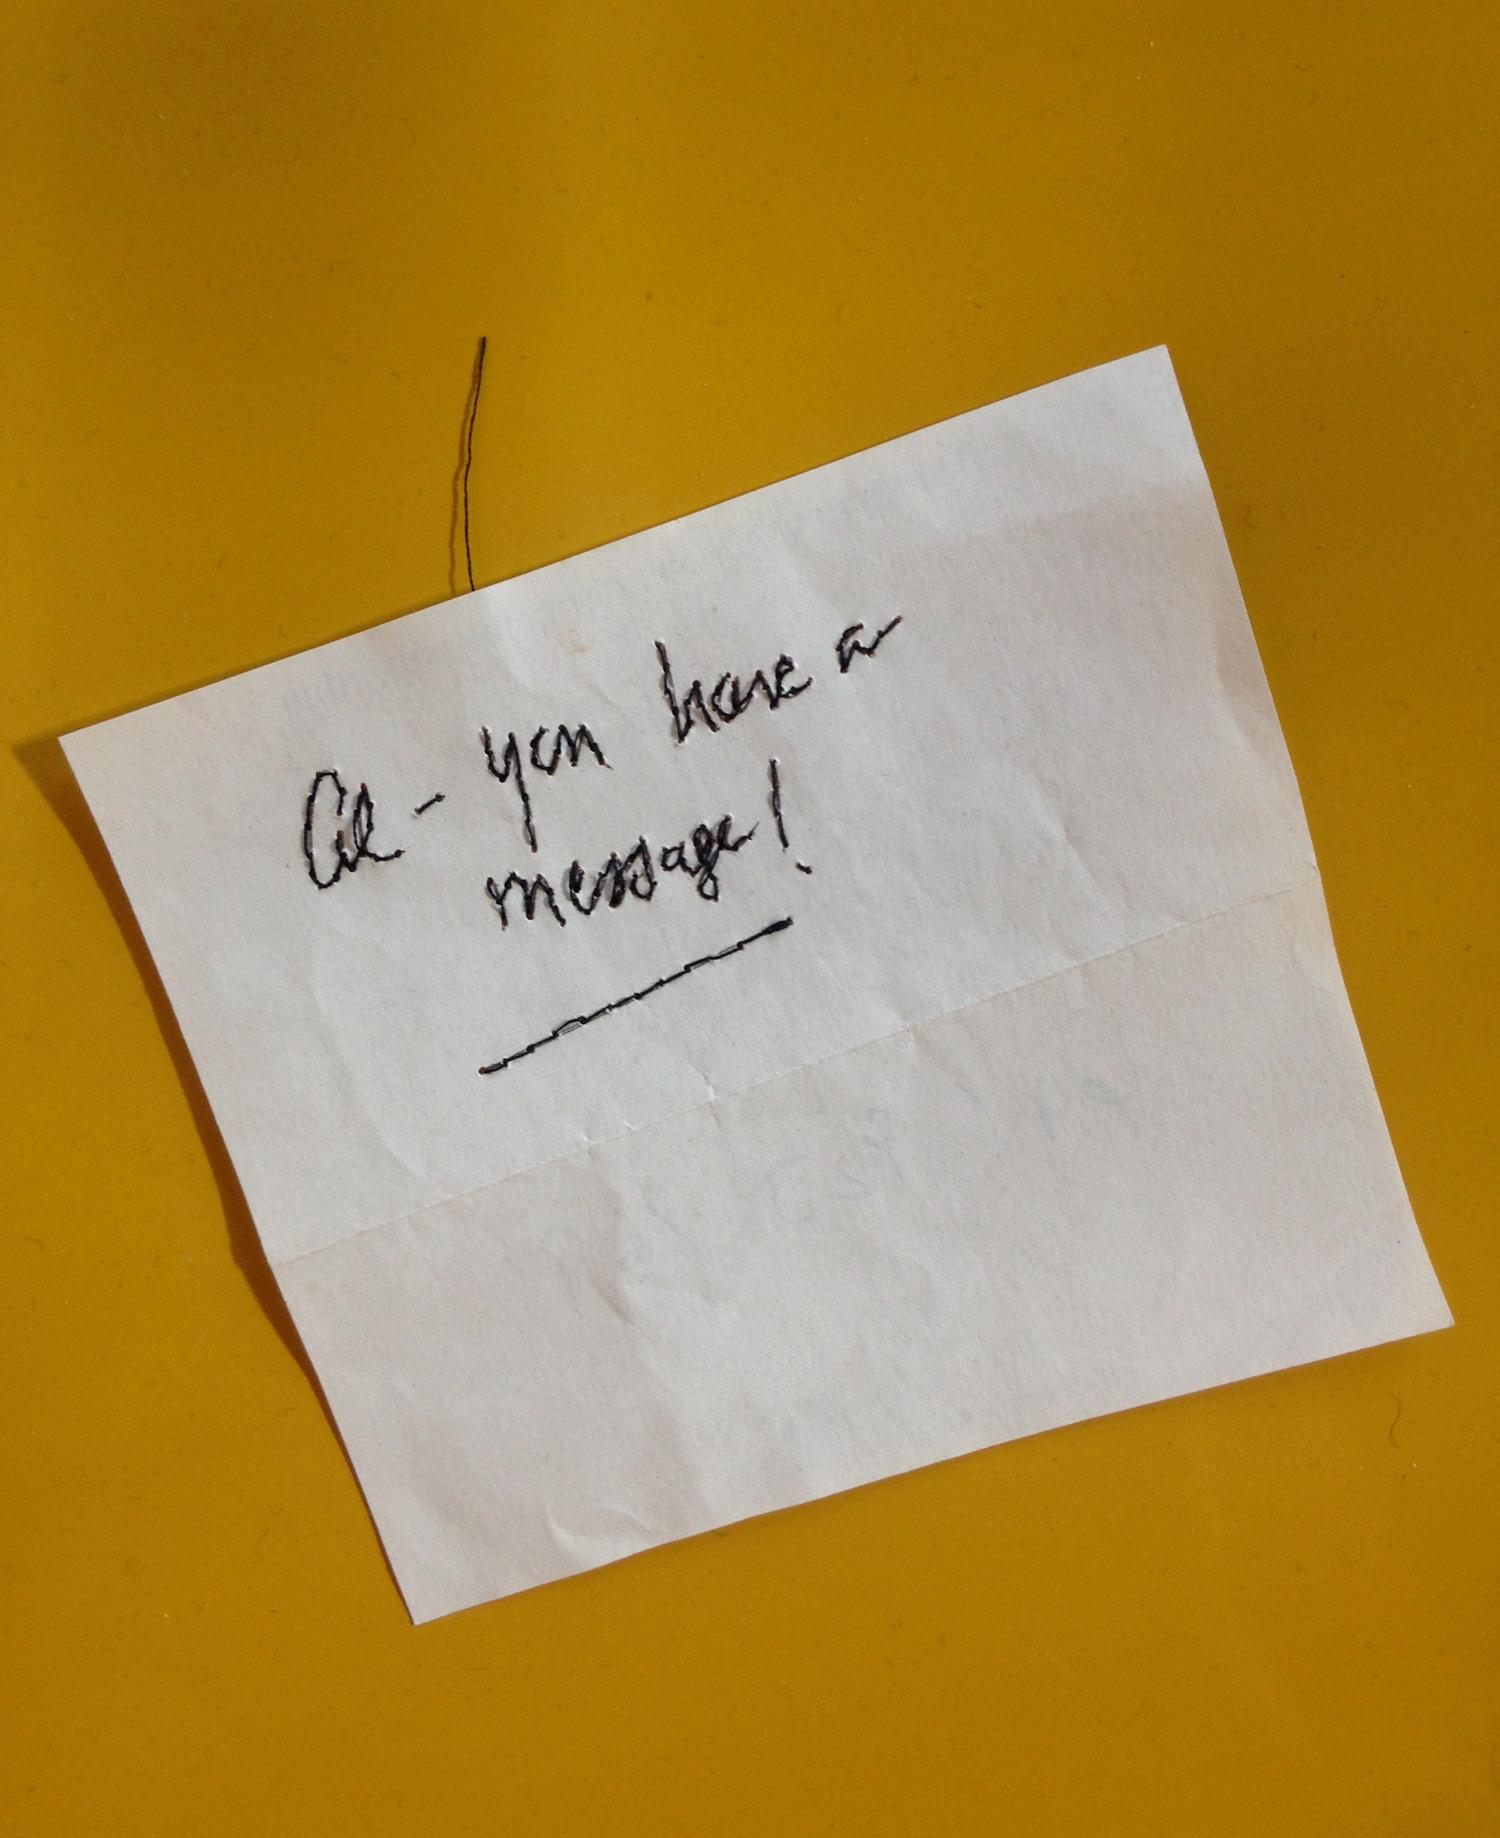 AL_YOU HAVE A MESSAGE!  (front)